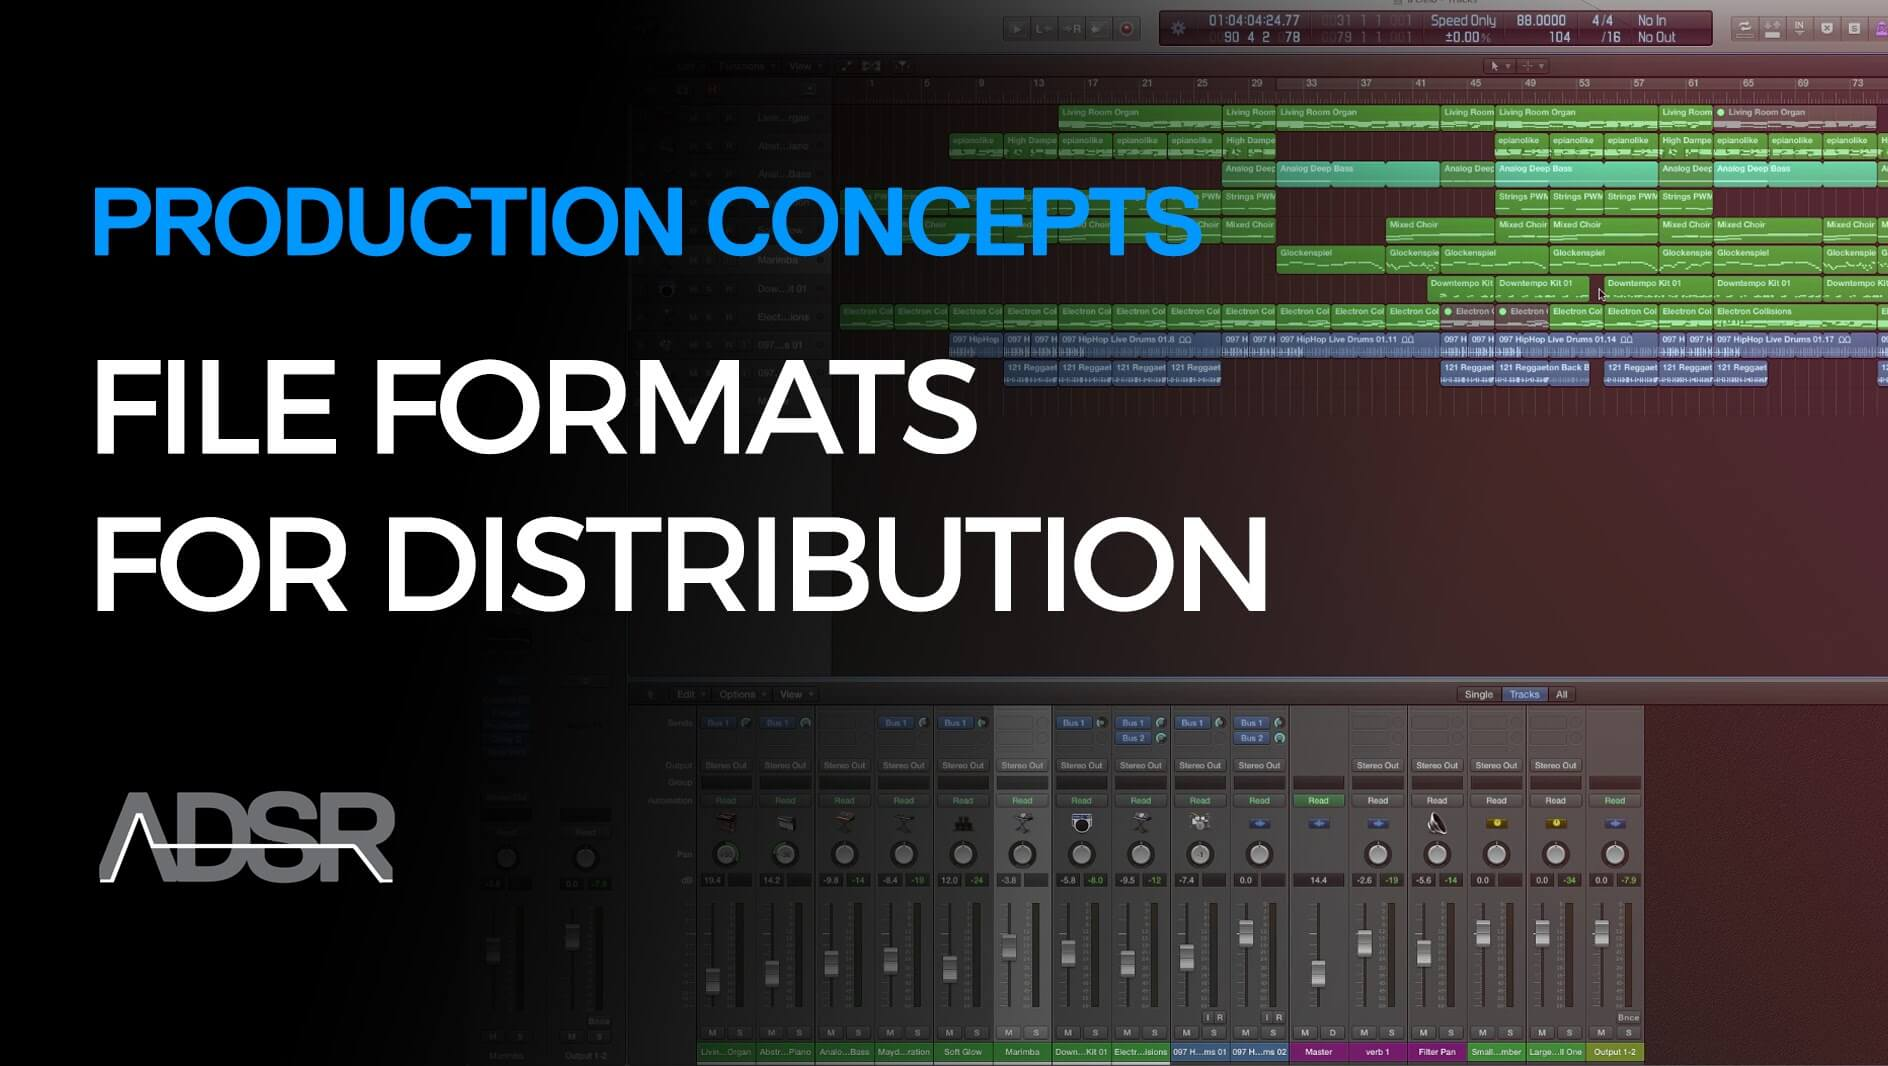 Master file formats for distribution